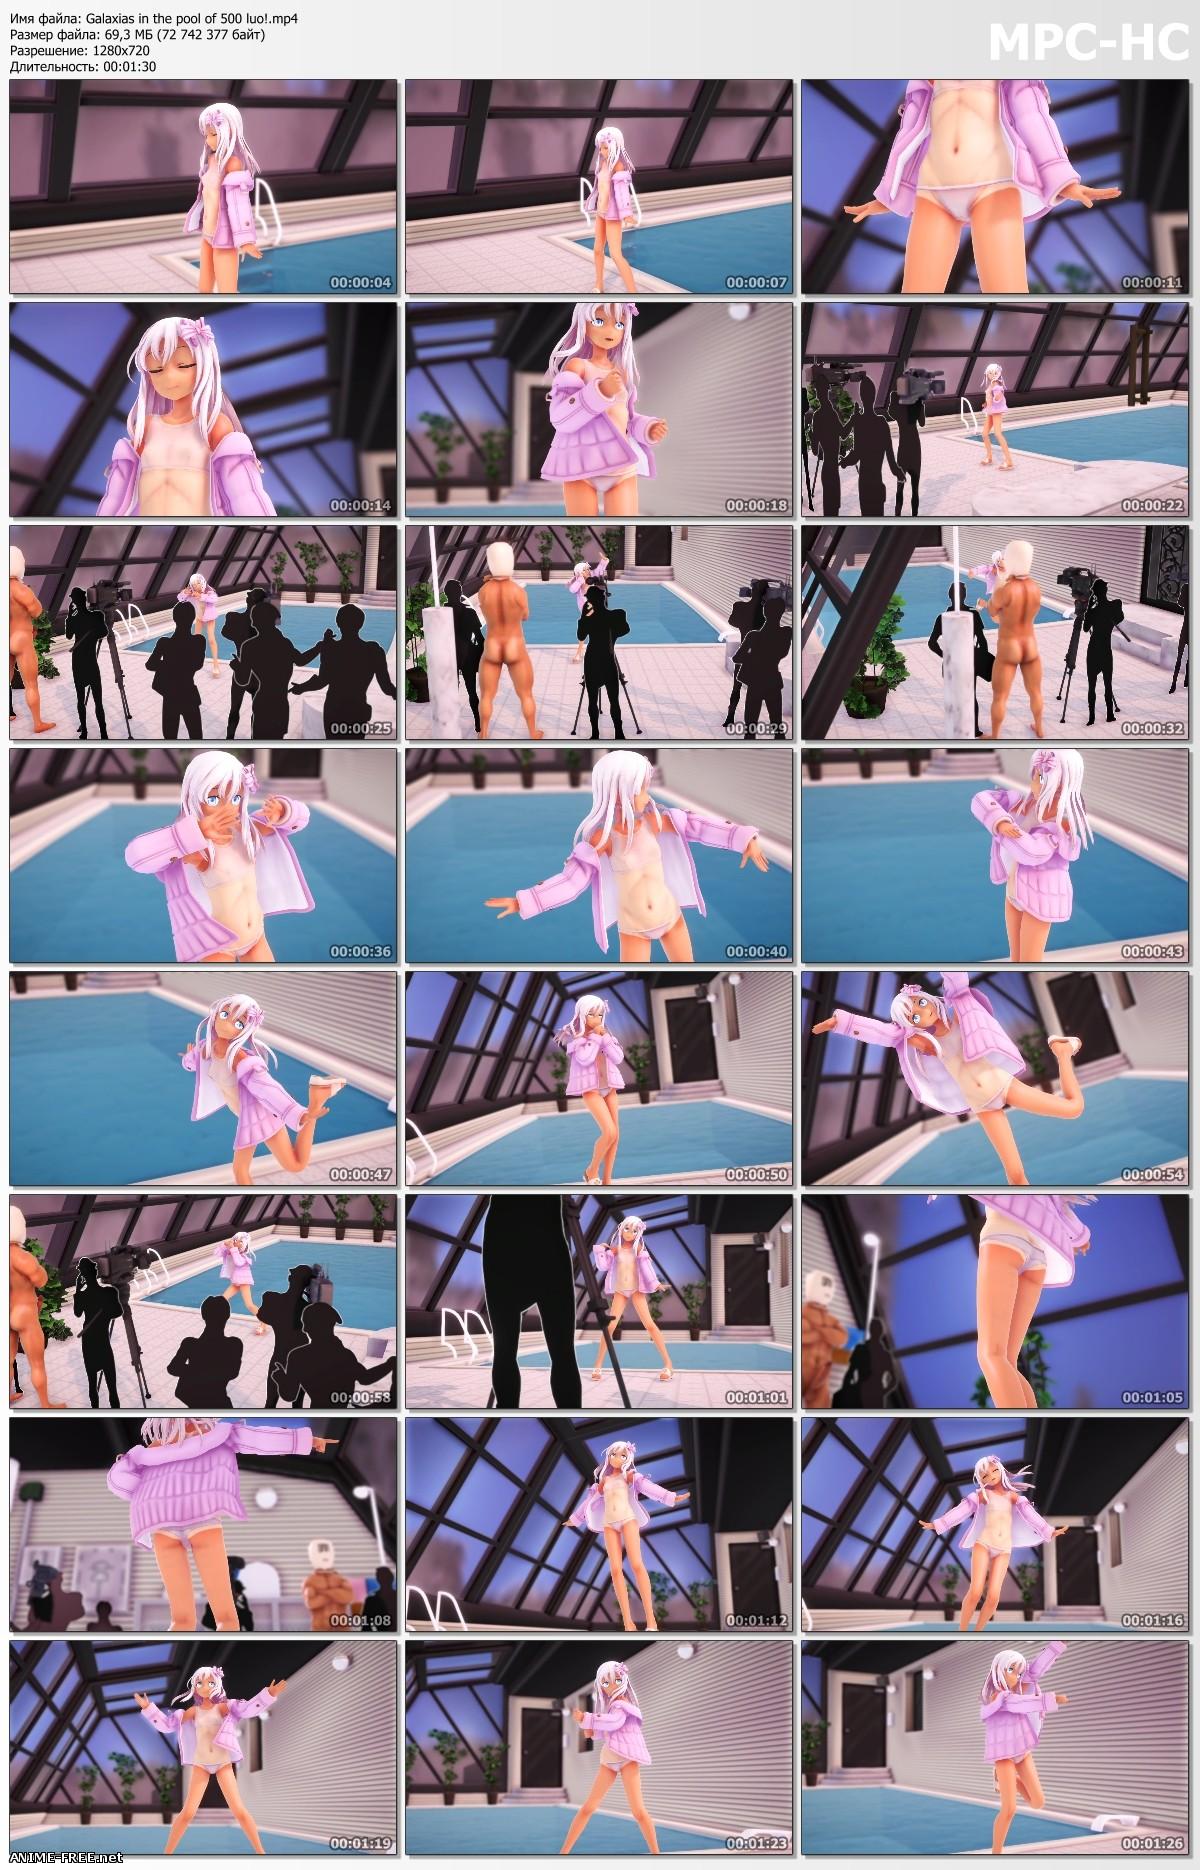 Sakanakura MMD works [2018] [Uncen] [Ep.1-17] [HD-720p/HD-1080p] [JAP] 3D-Hentai